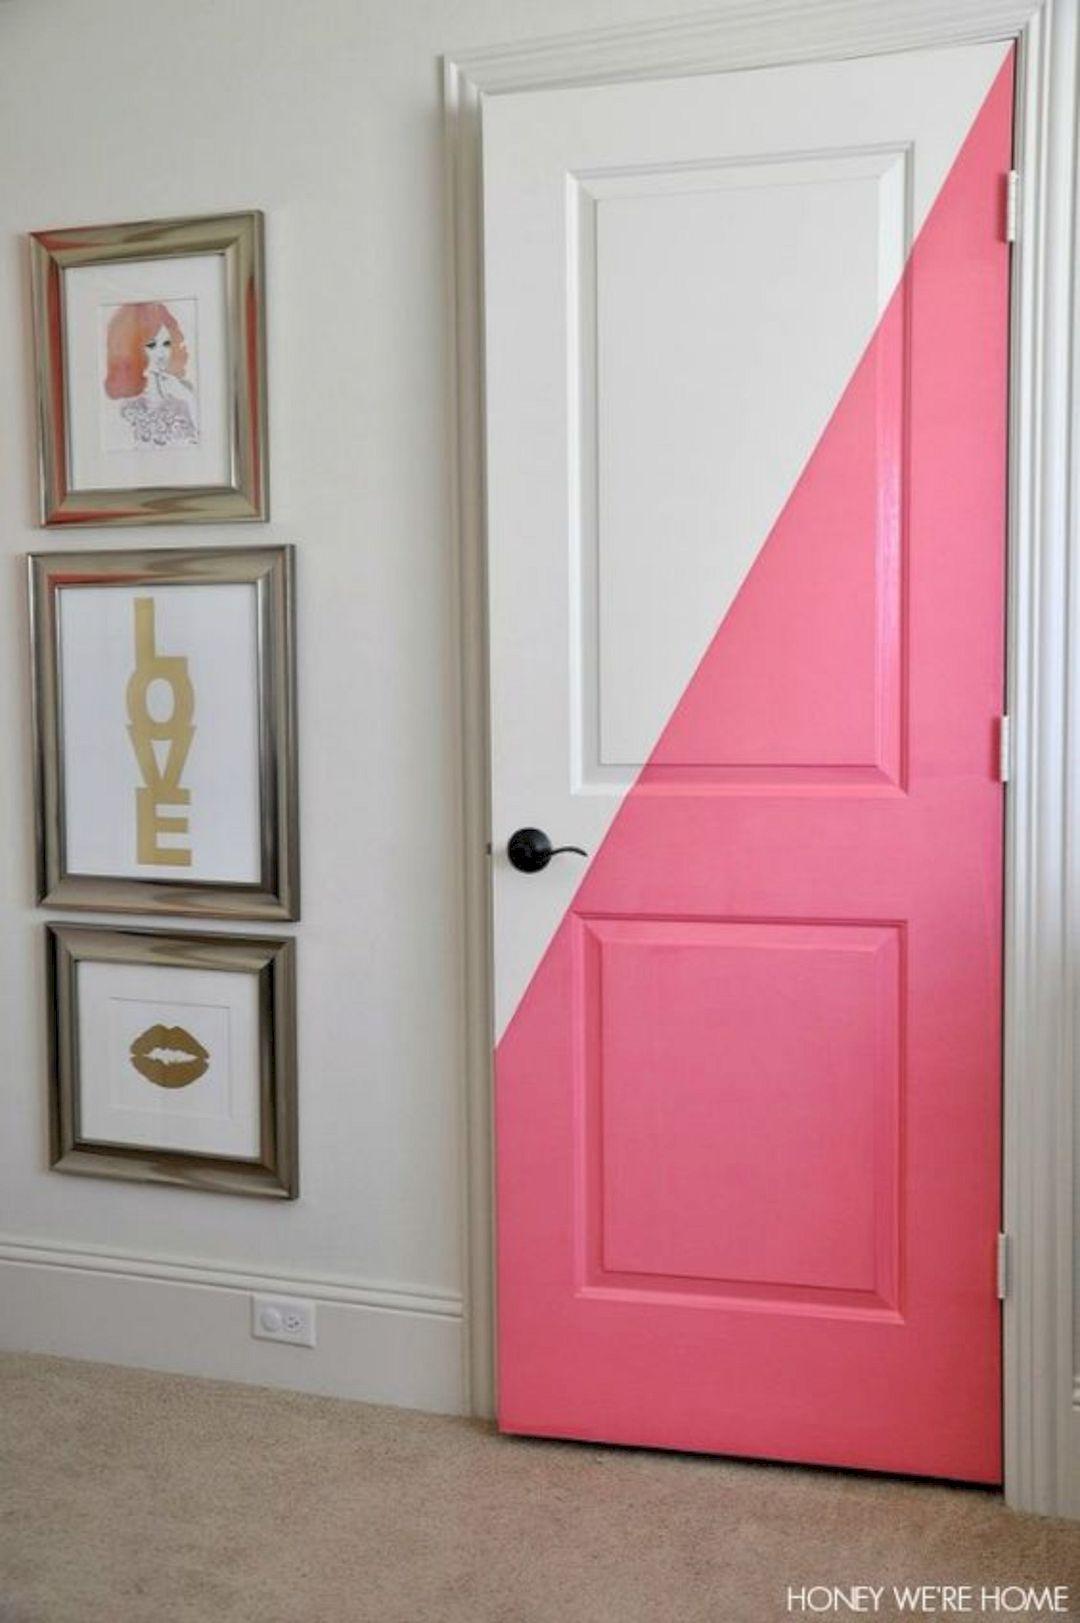 16 Brilliant Painted Furniture Ideas To Transform Your Bedroom Bedroom Door Decorations Painted Bedroom Doors Painted Closet